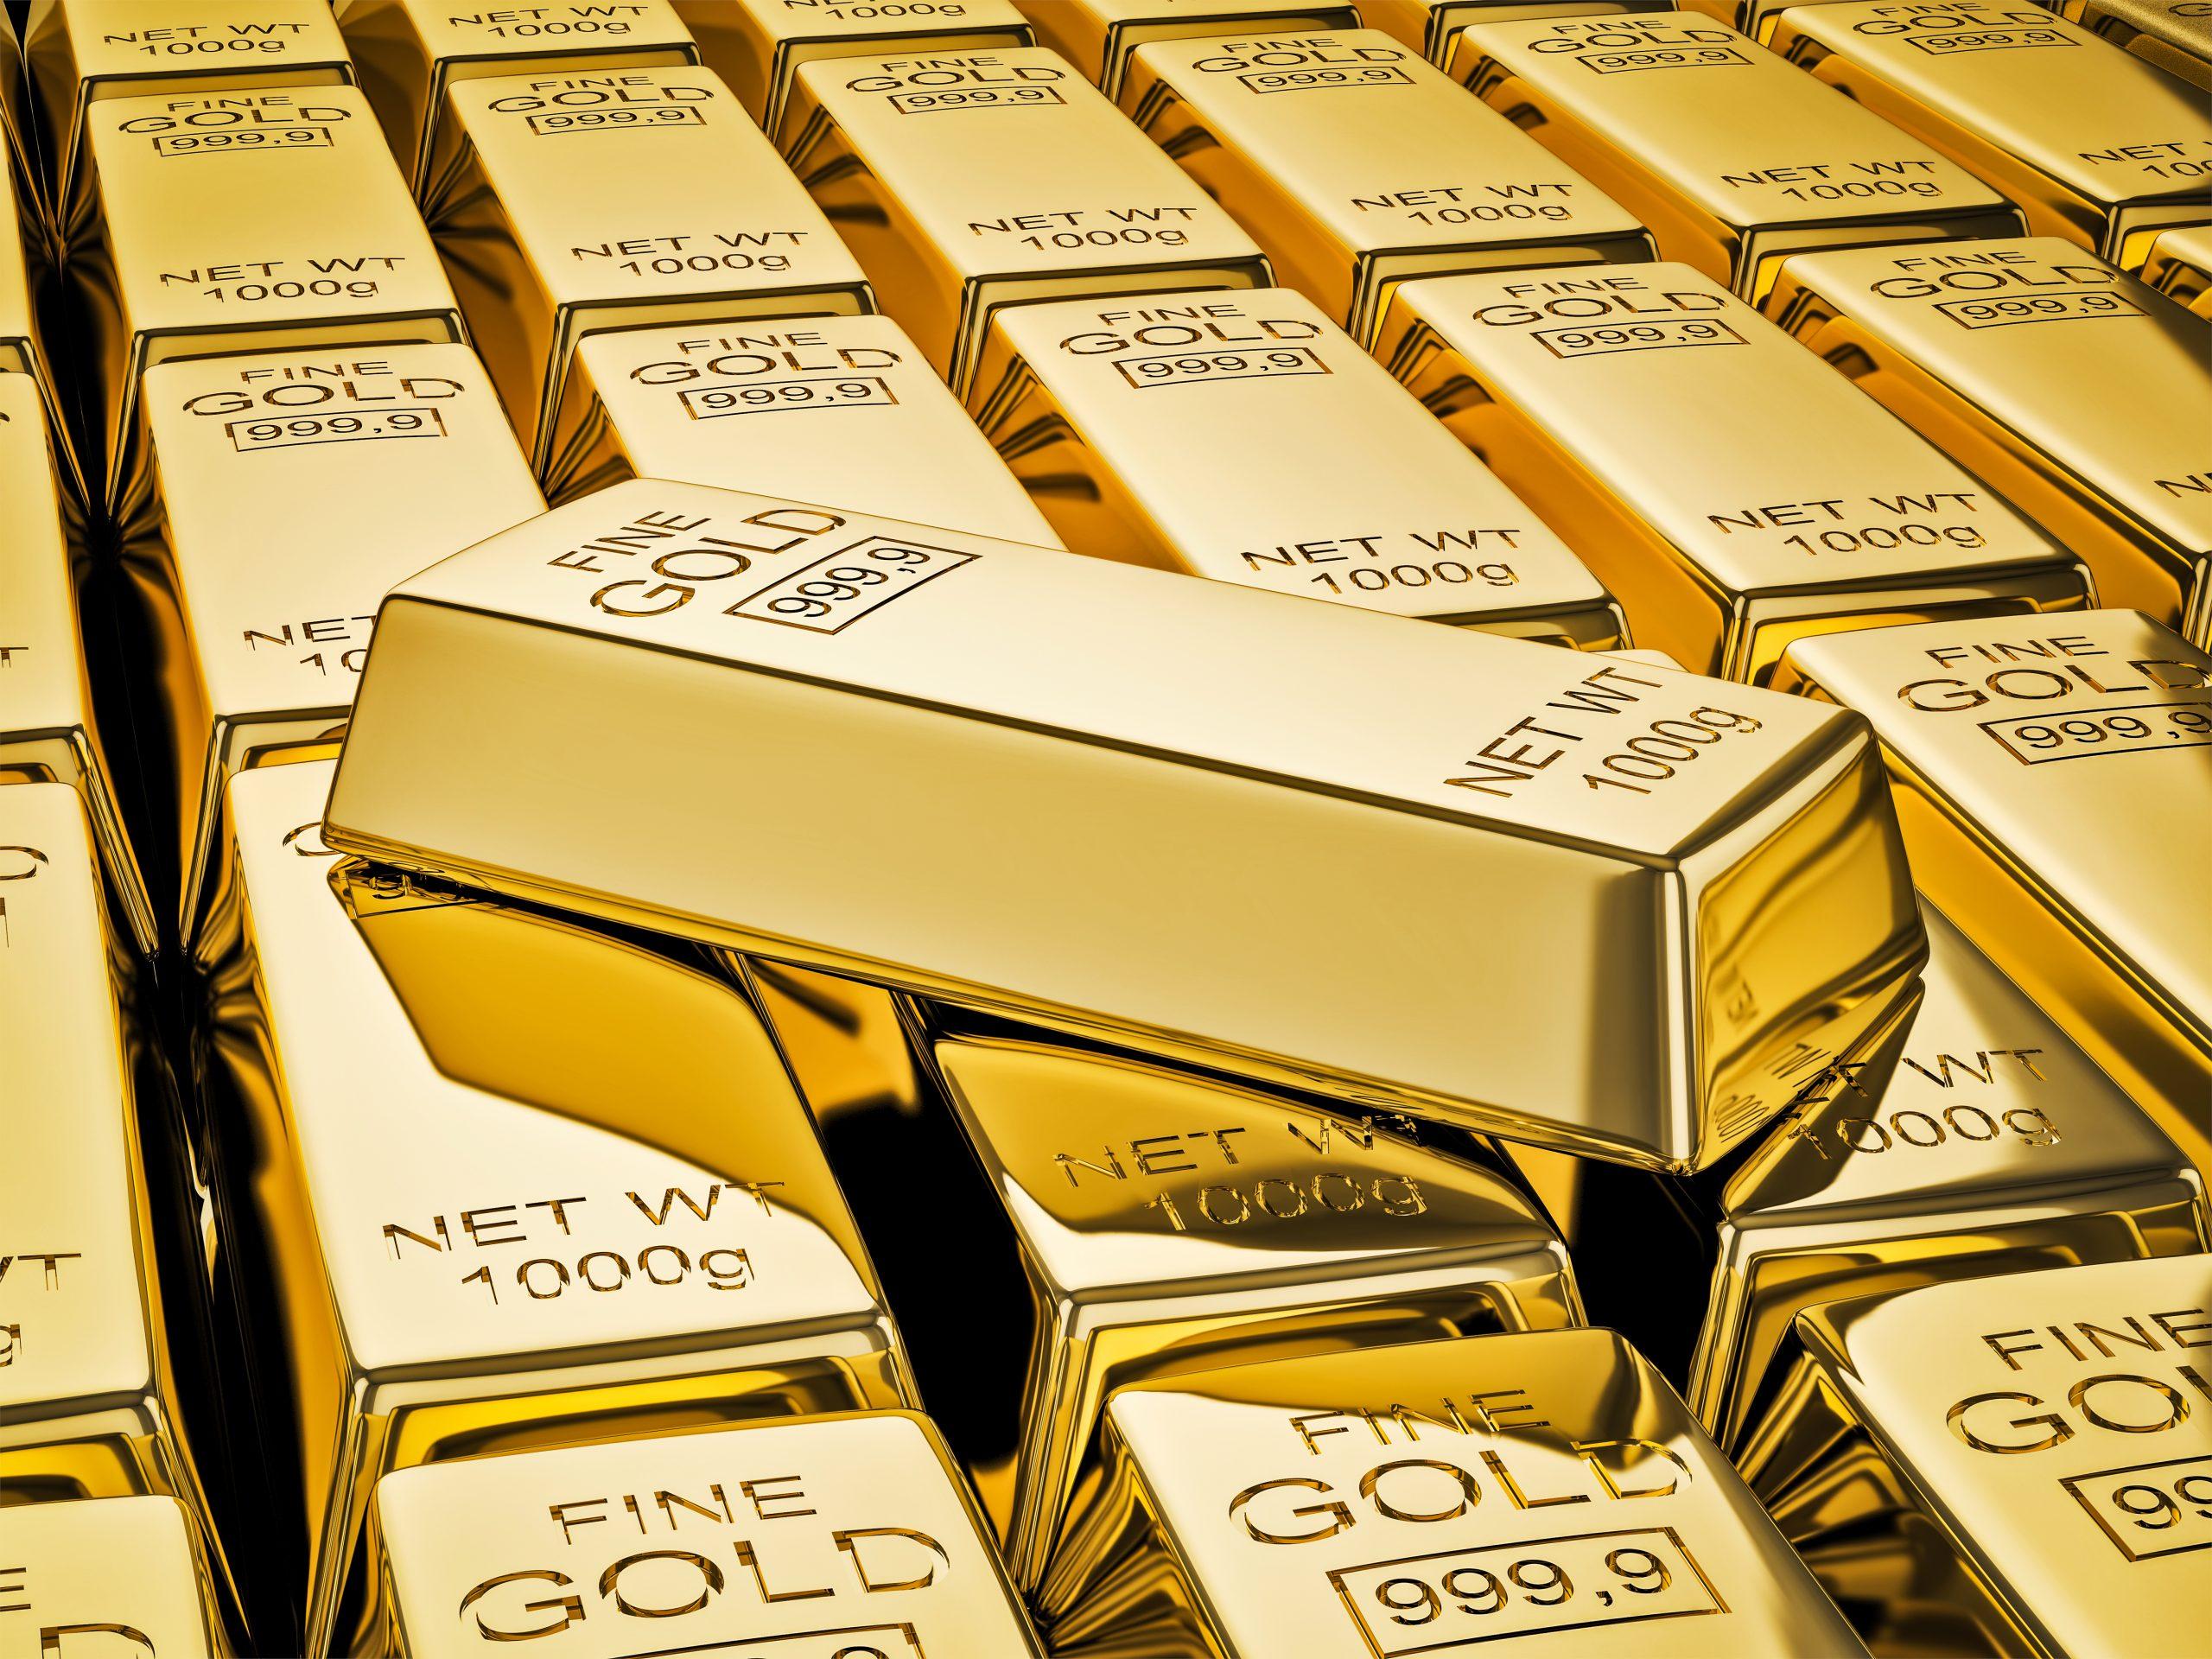 Stacks of 1 kg gold bars